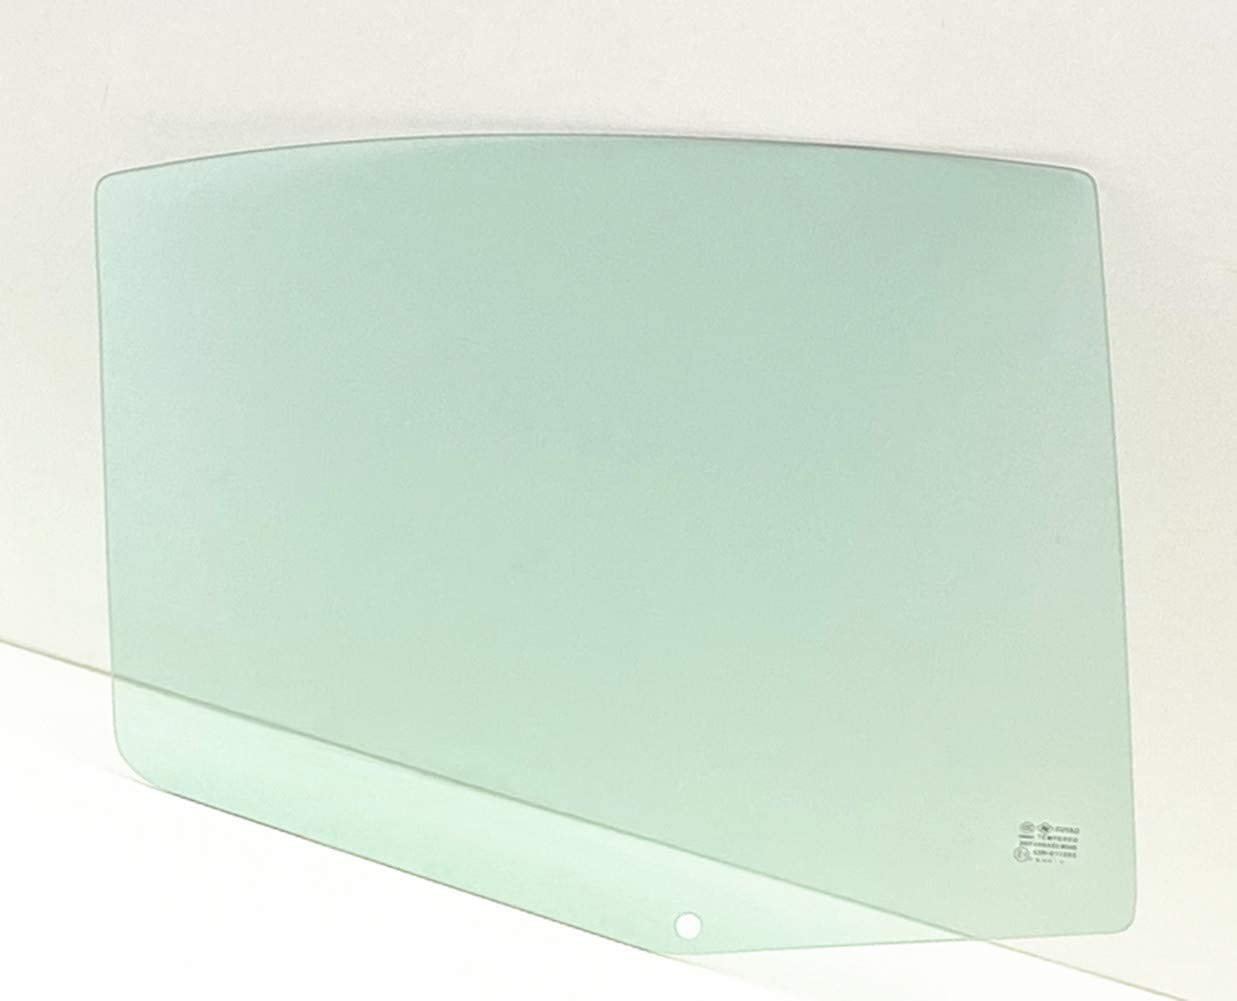 NAGD Compatible with 2001-2005 BMW 325i 330i 1999-2000 BMW 323i 328i 4 Door Sedan Passenger Right Side Rear Door Window Glass